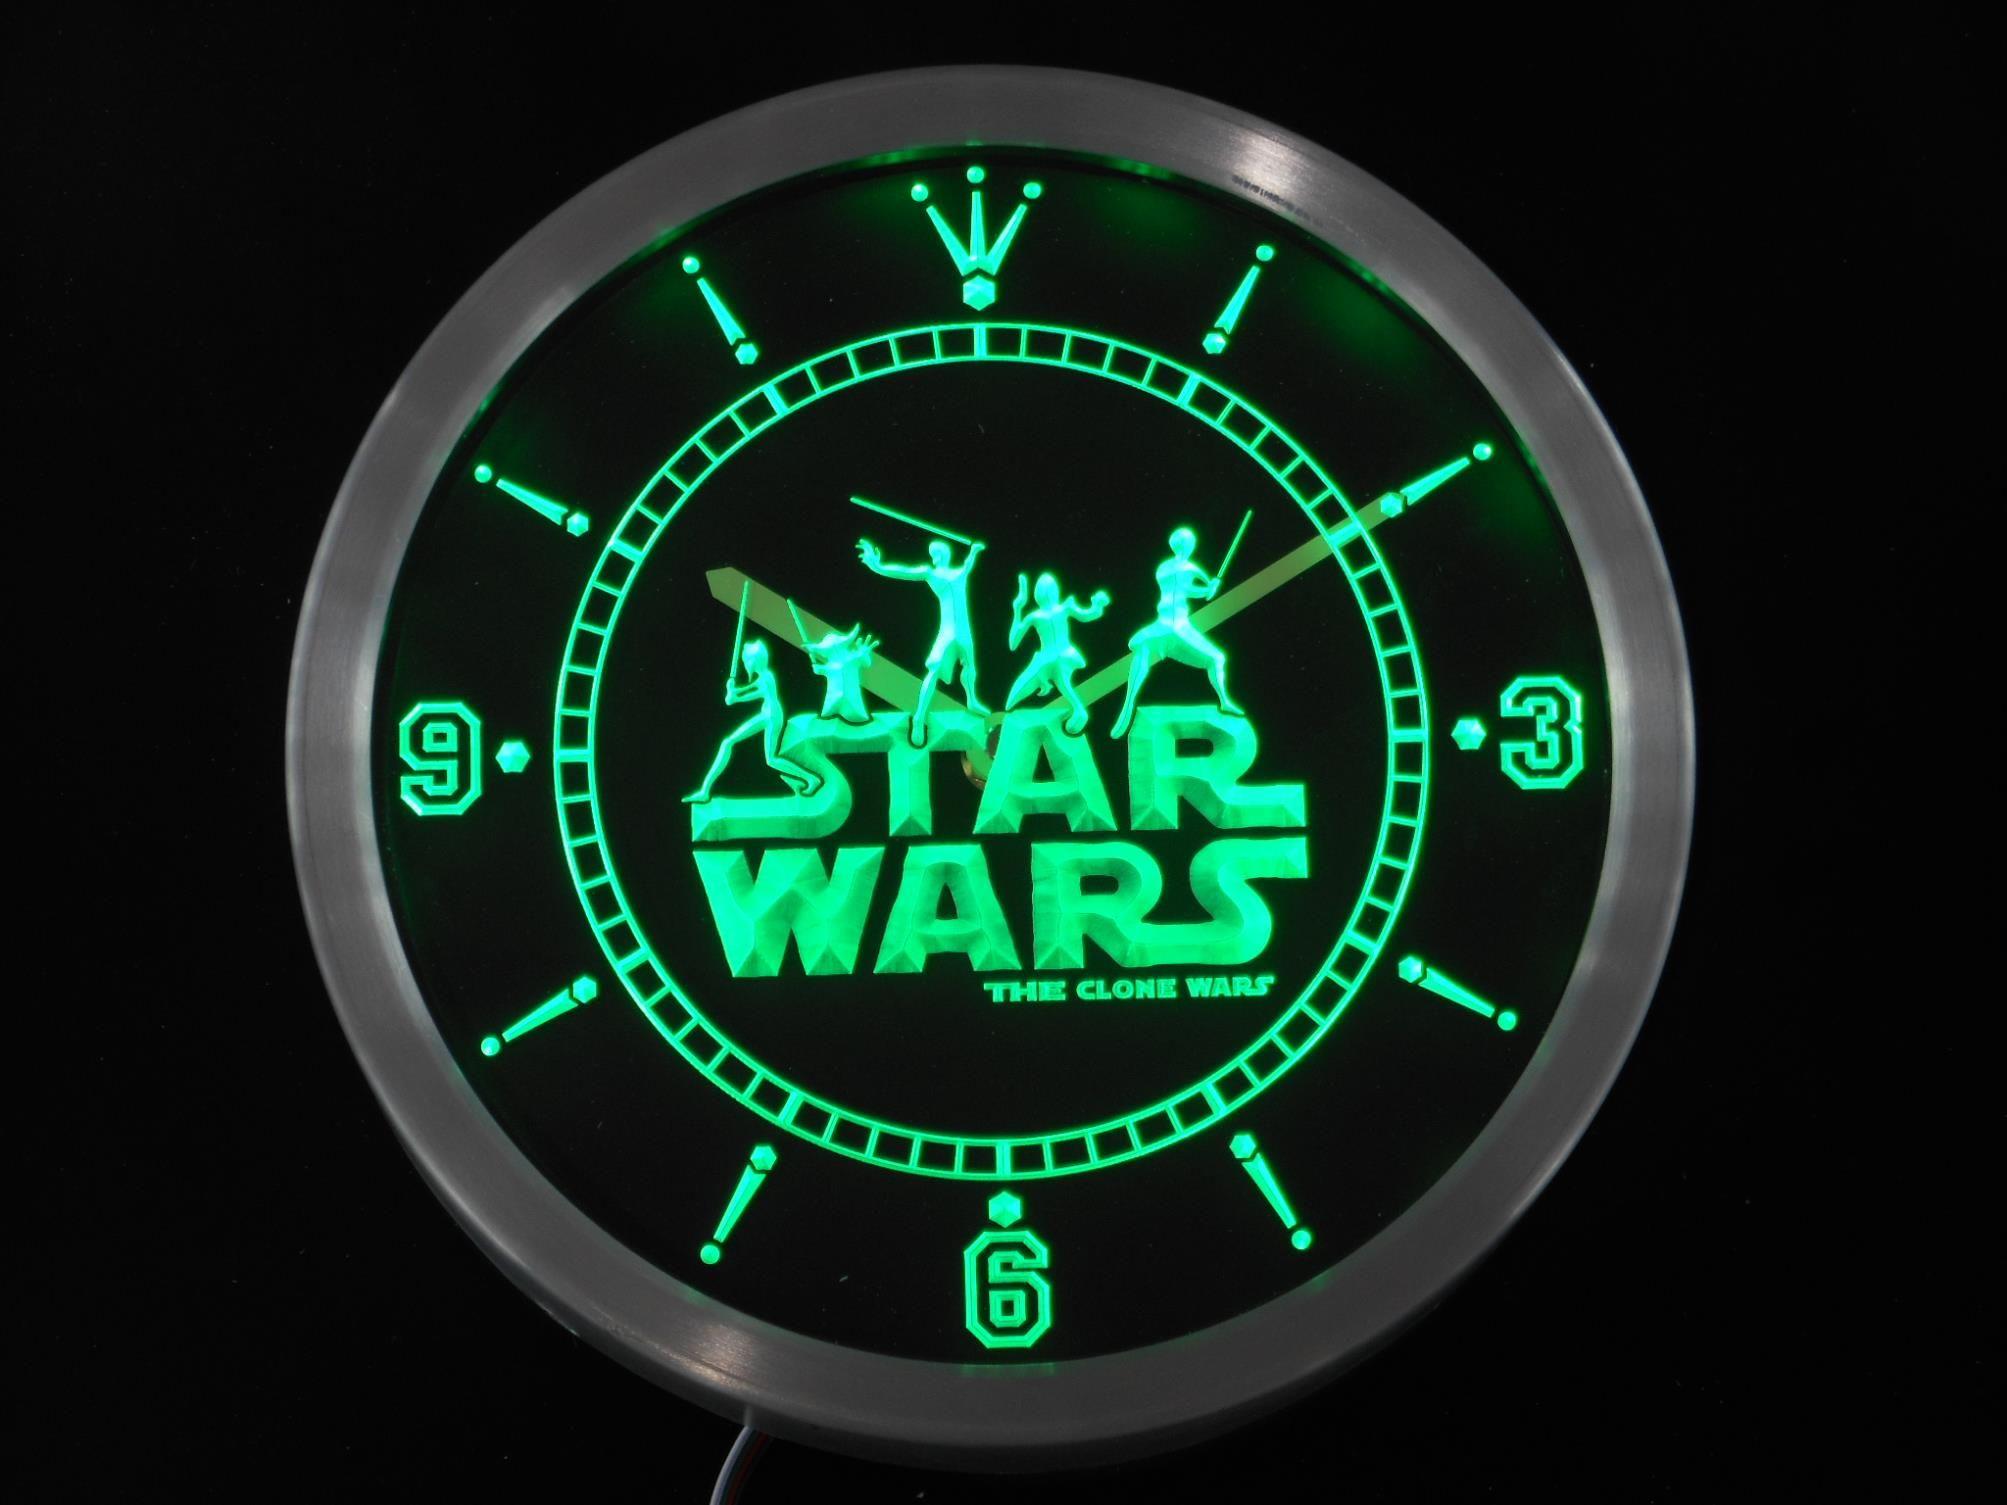 Nc0218 Star Wars The Clone Wars Jedi Neon Sign Led Wall Clock Led Wall Clock Bud Light Lime Dr Pepper